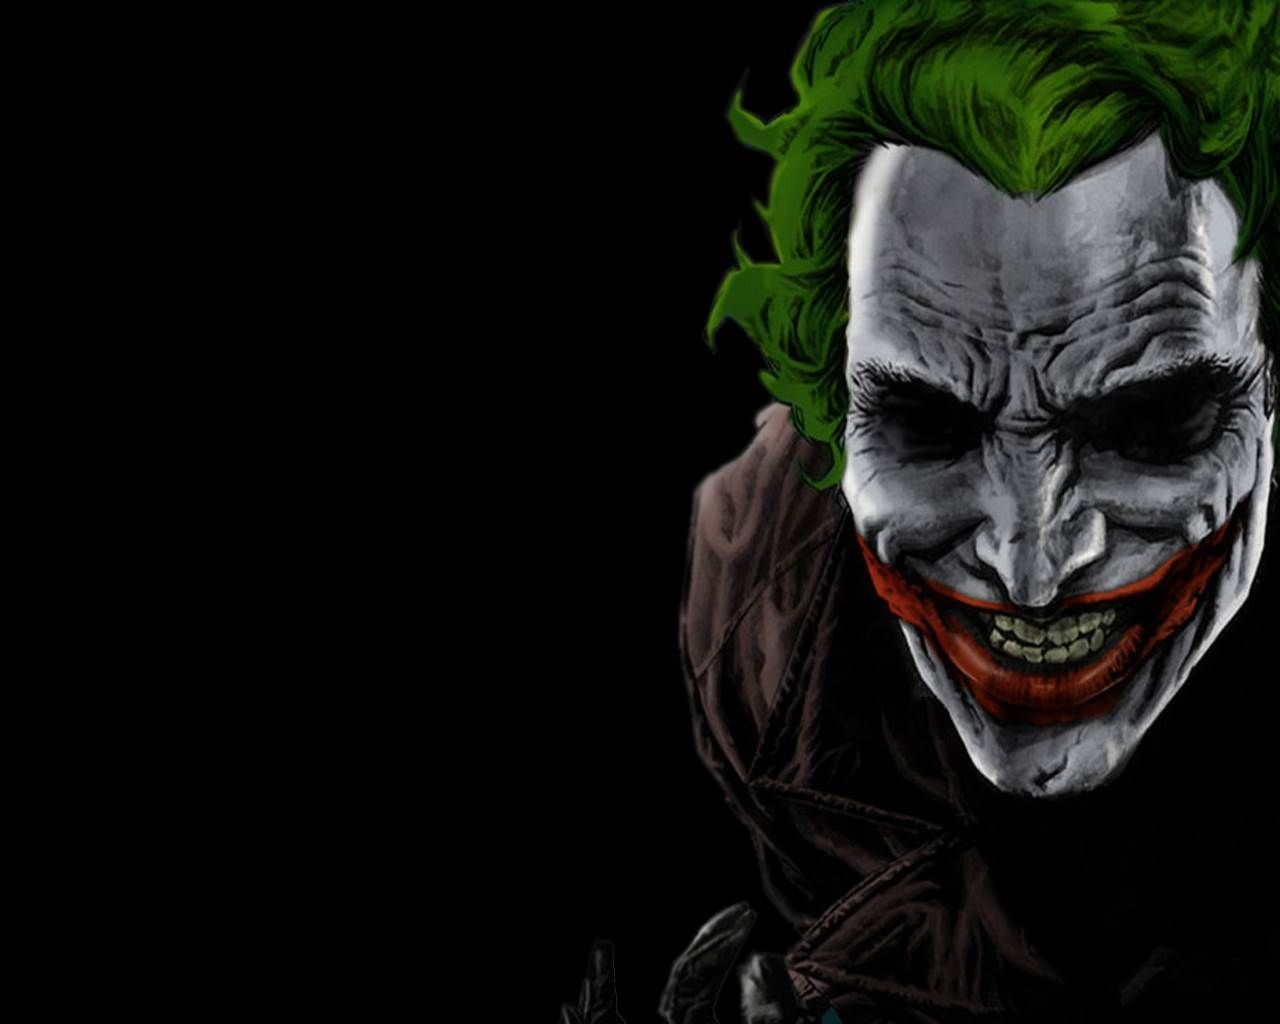 Joker Quotes Wallpaper Hd Joker Wallpapers High Quality Download Free 1280 215 1024